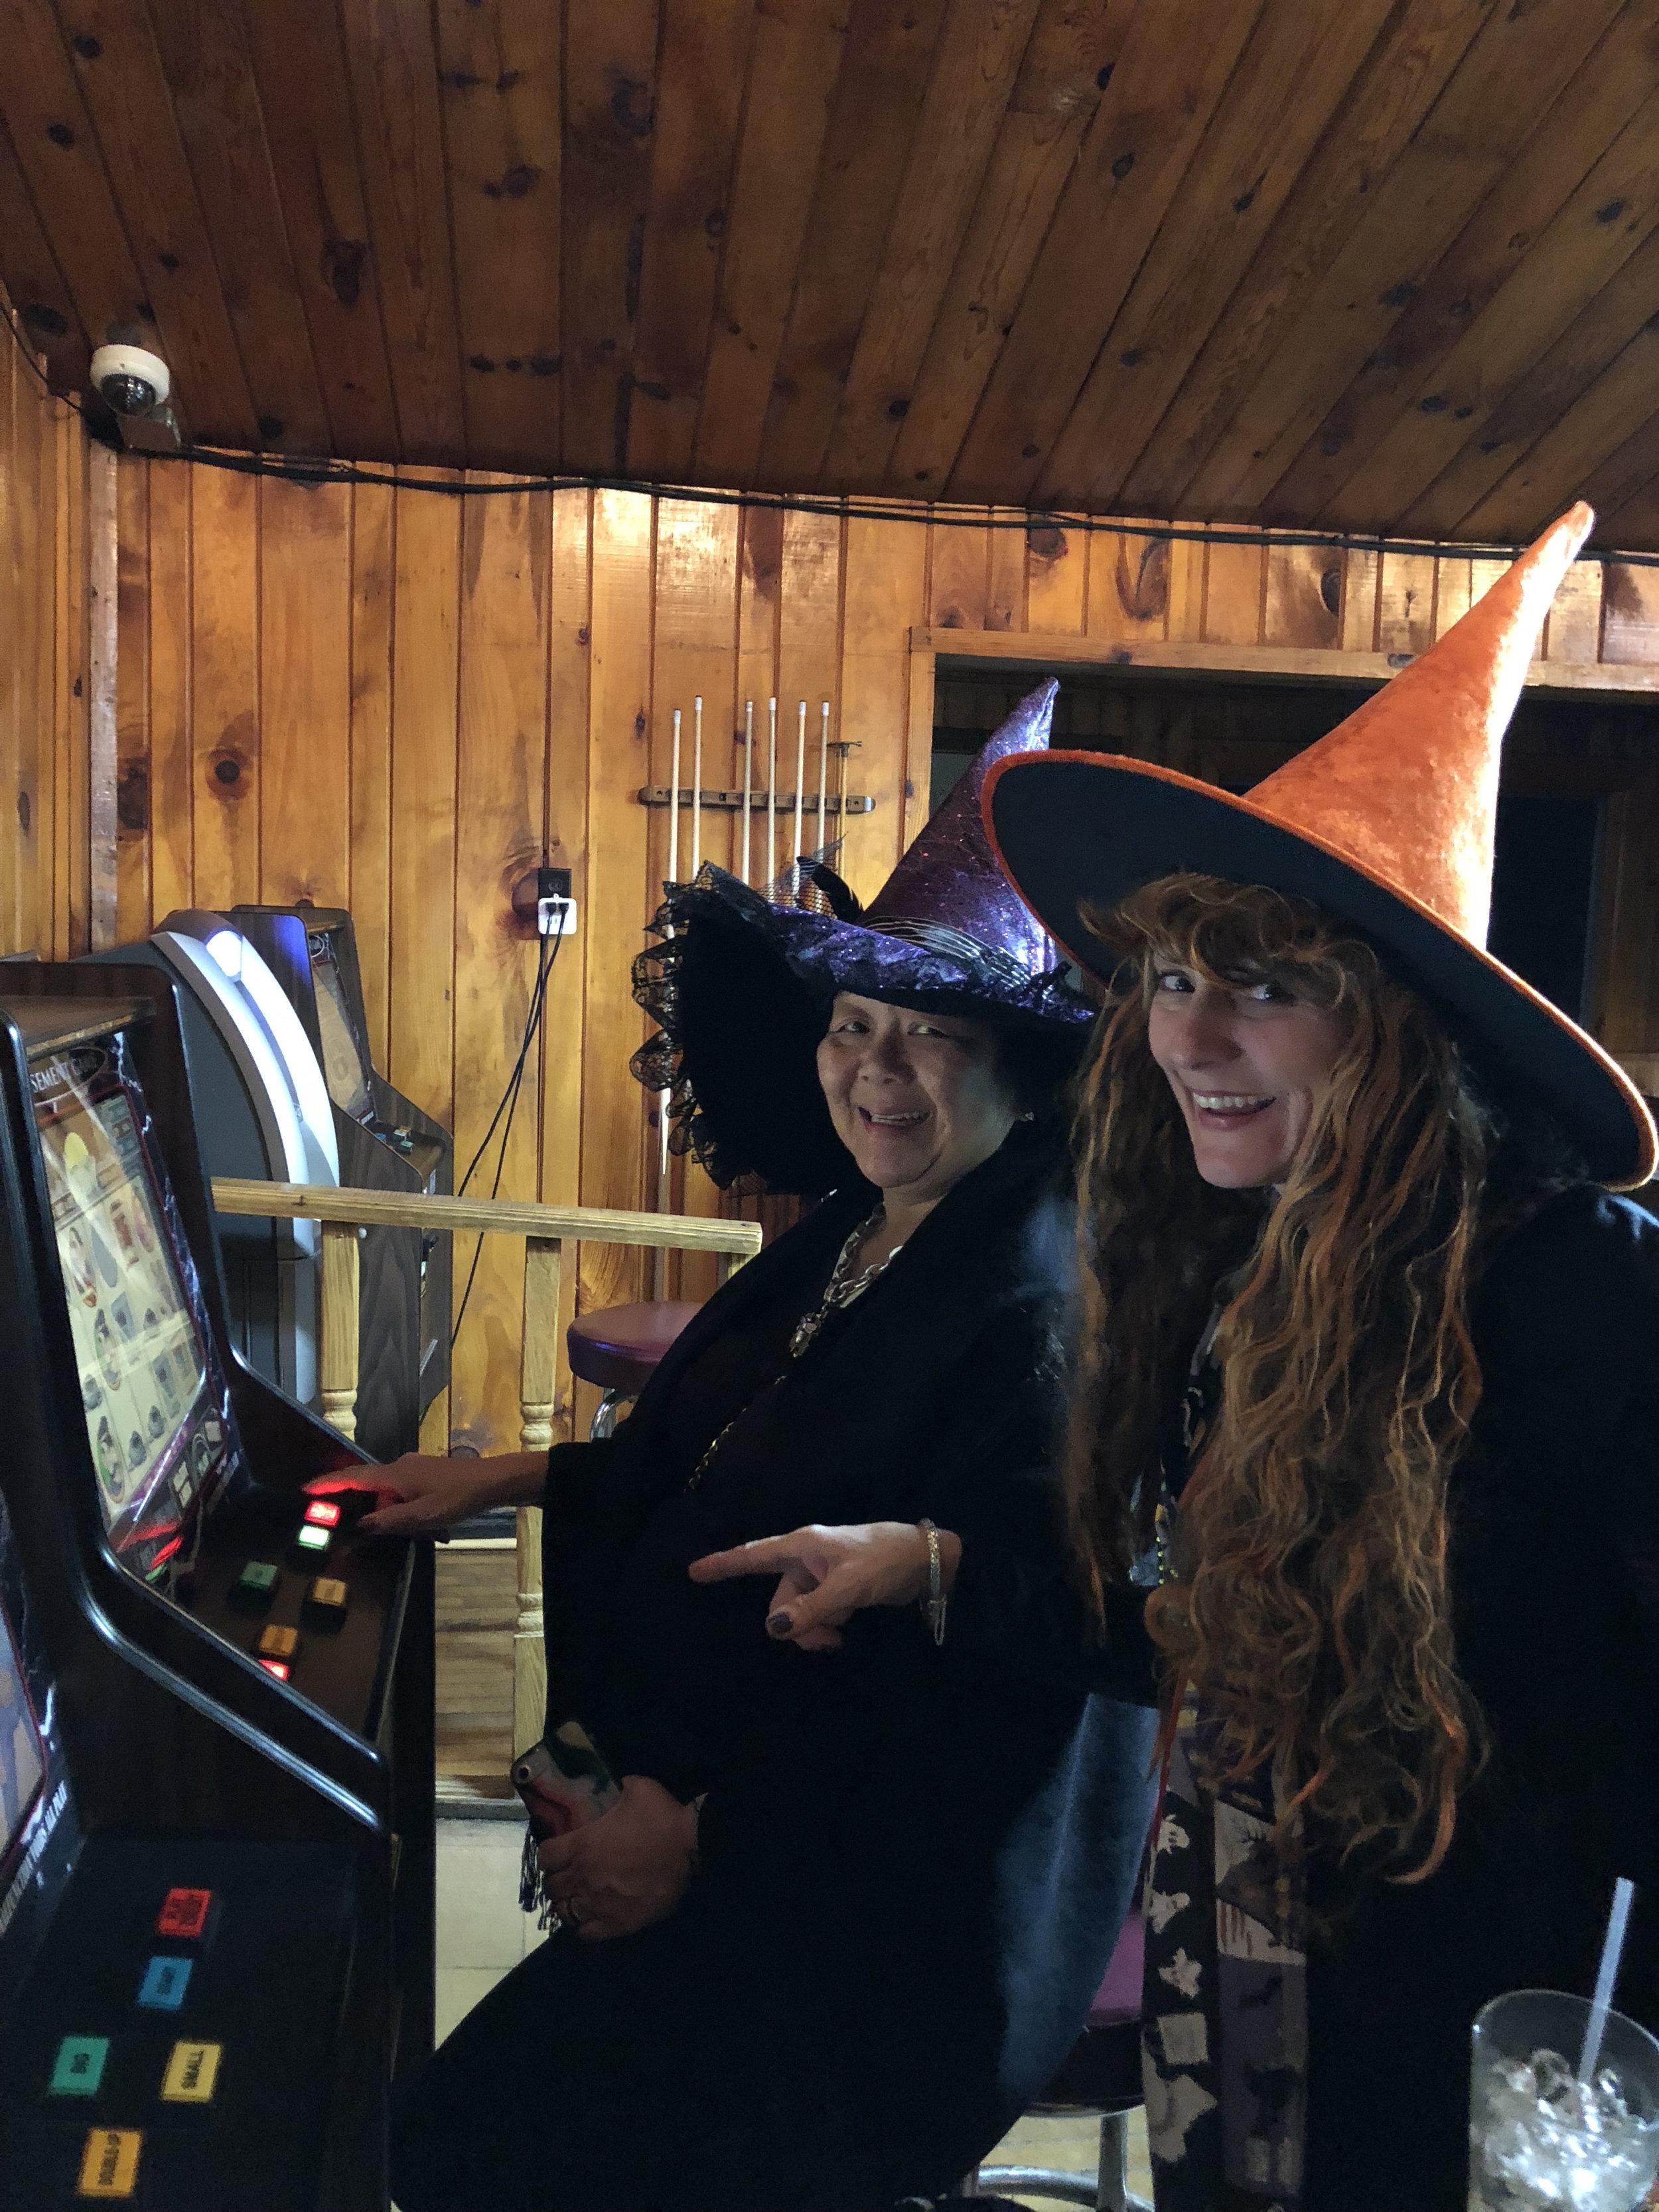 teri_w3bookclub_Wicked_halloween_spiritedtable_photo46.jpg